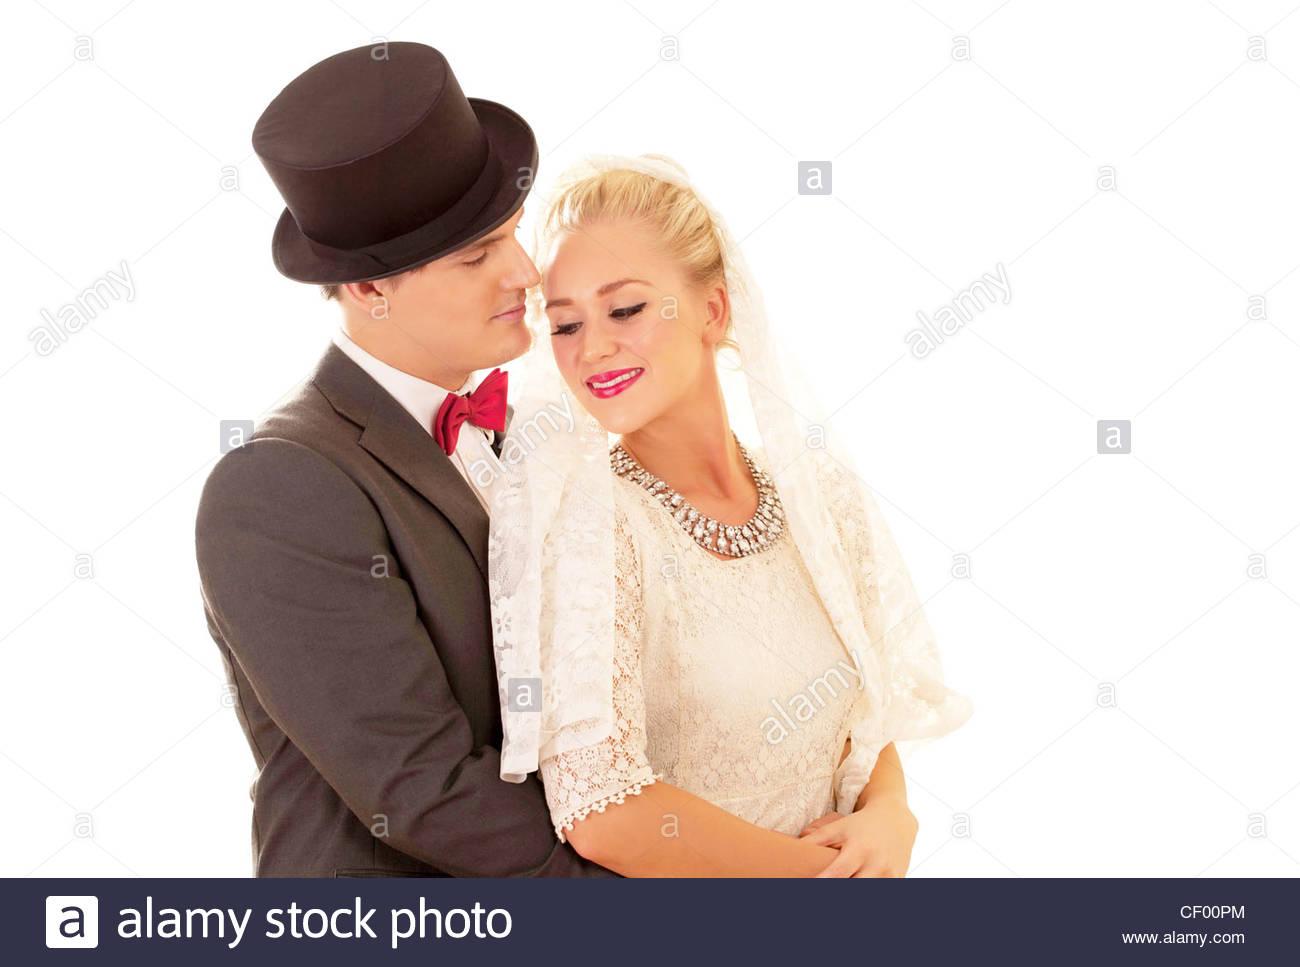 Newly wed couple - Stock Image